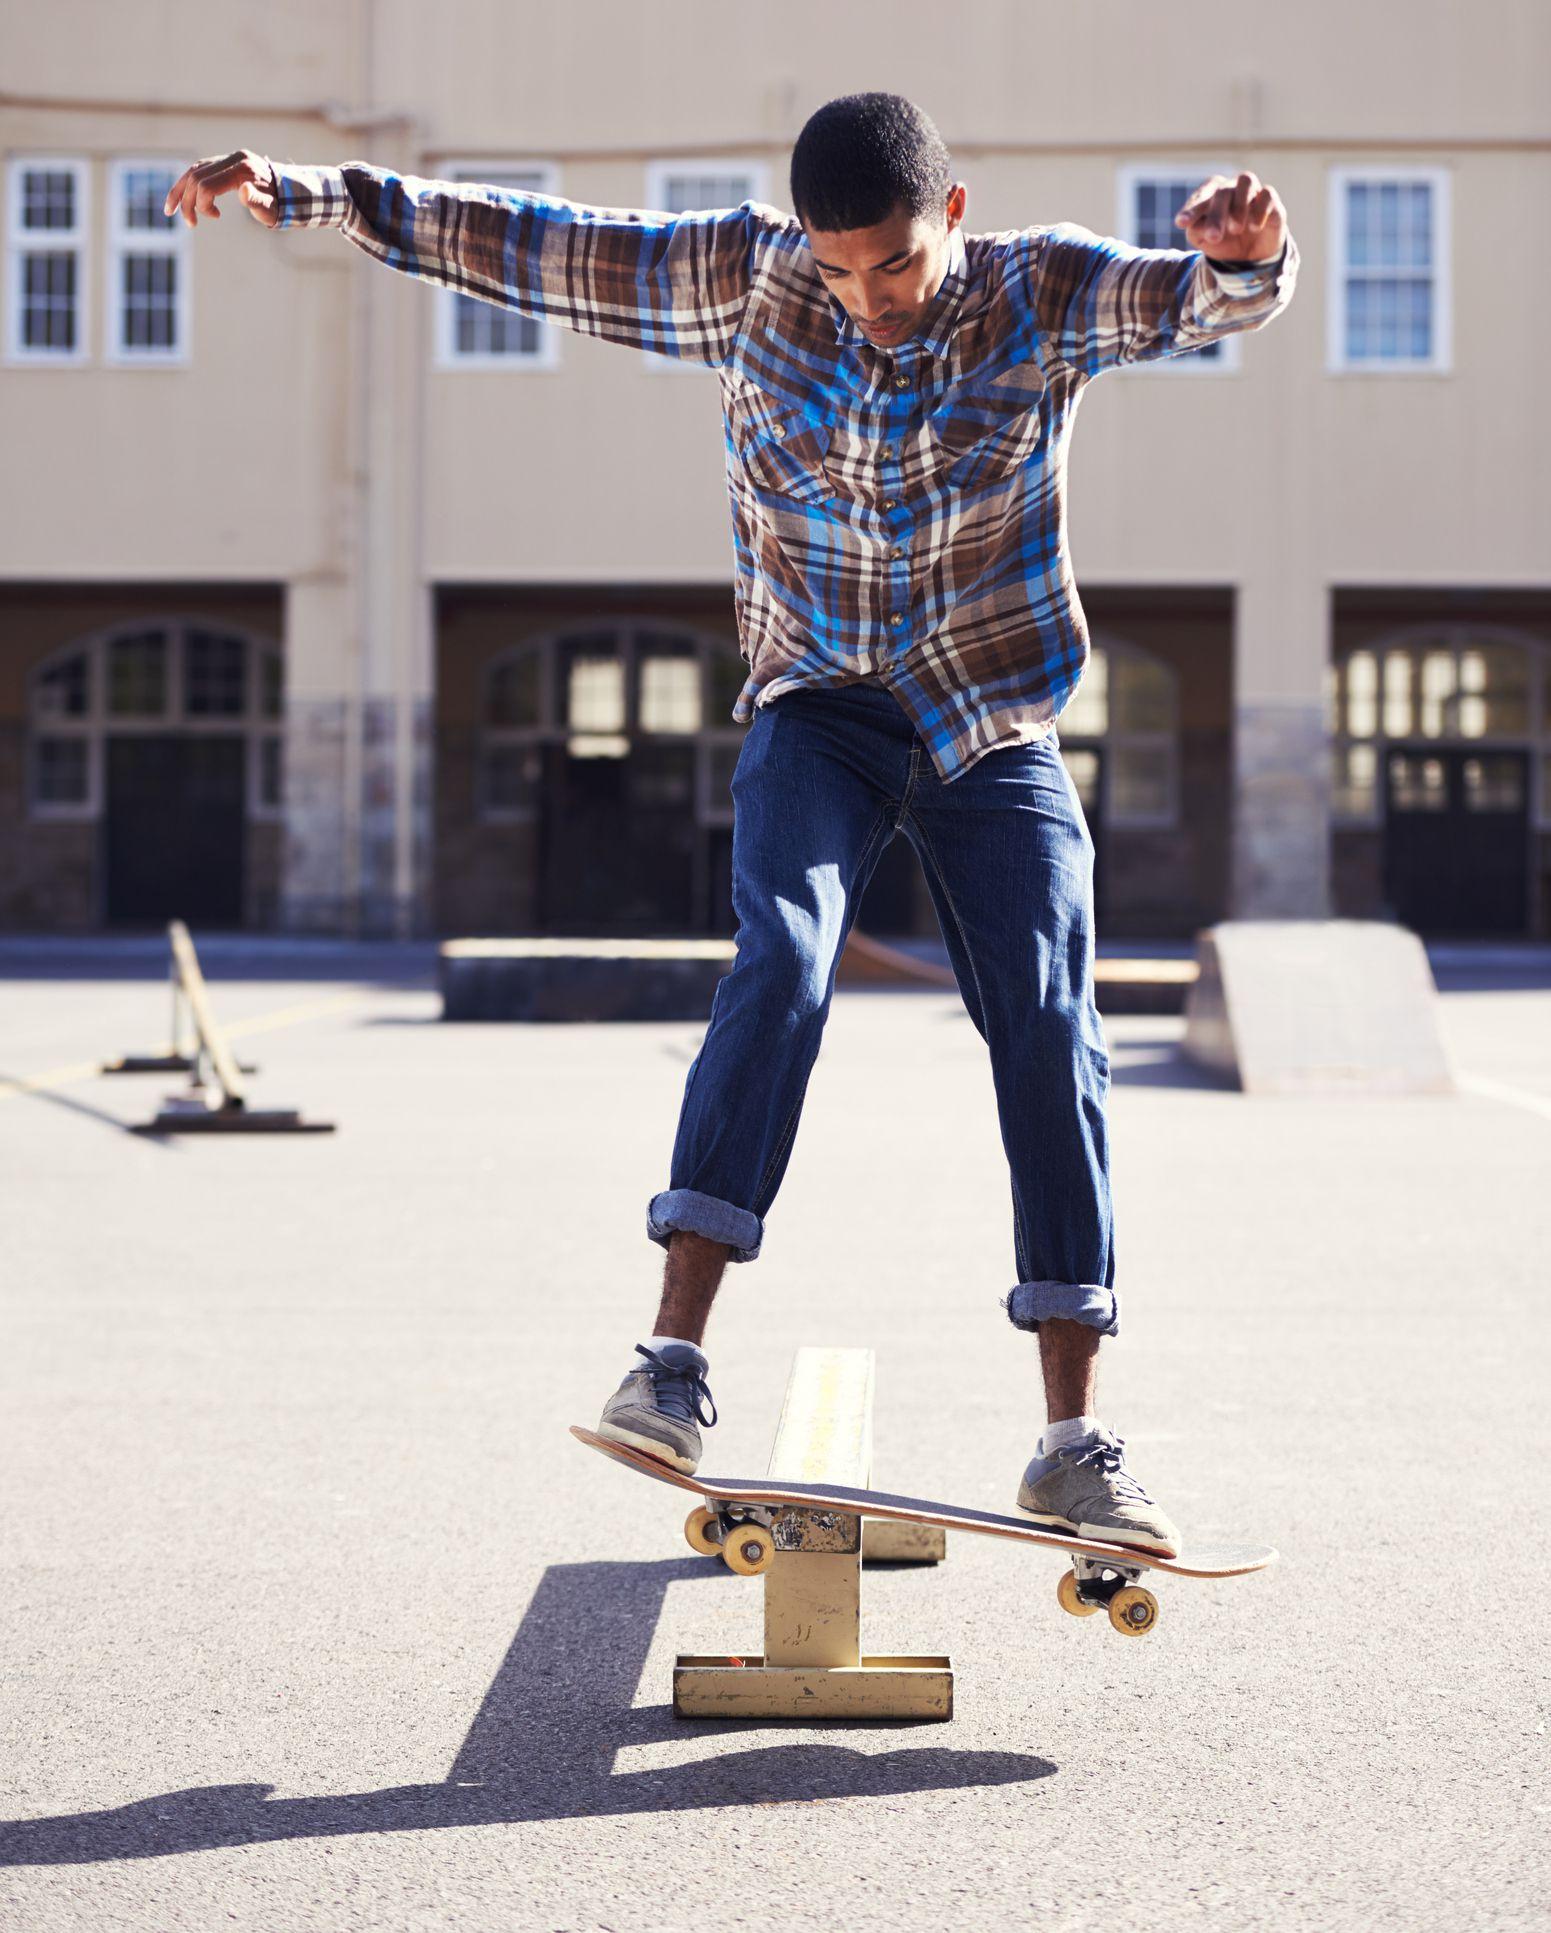 How To Build A Skateboard Grind Rail